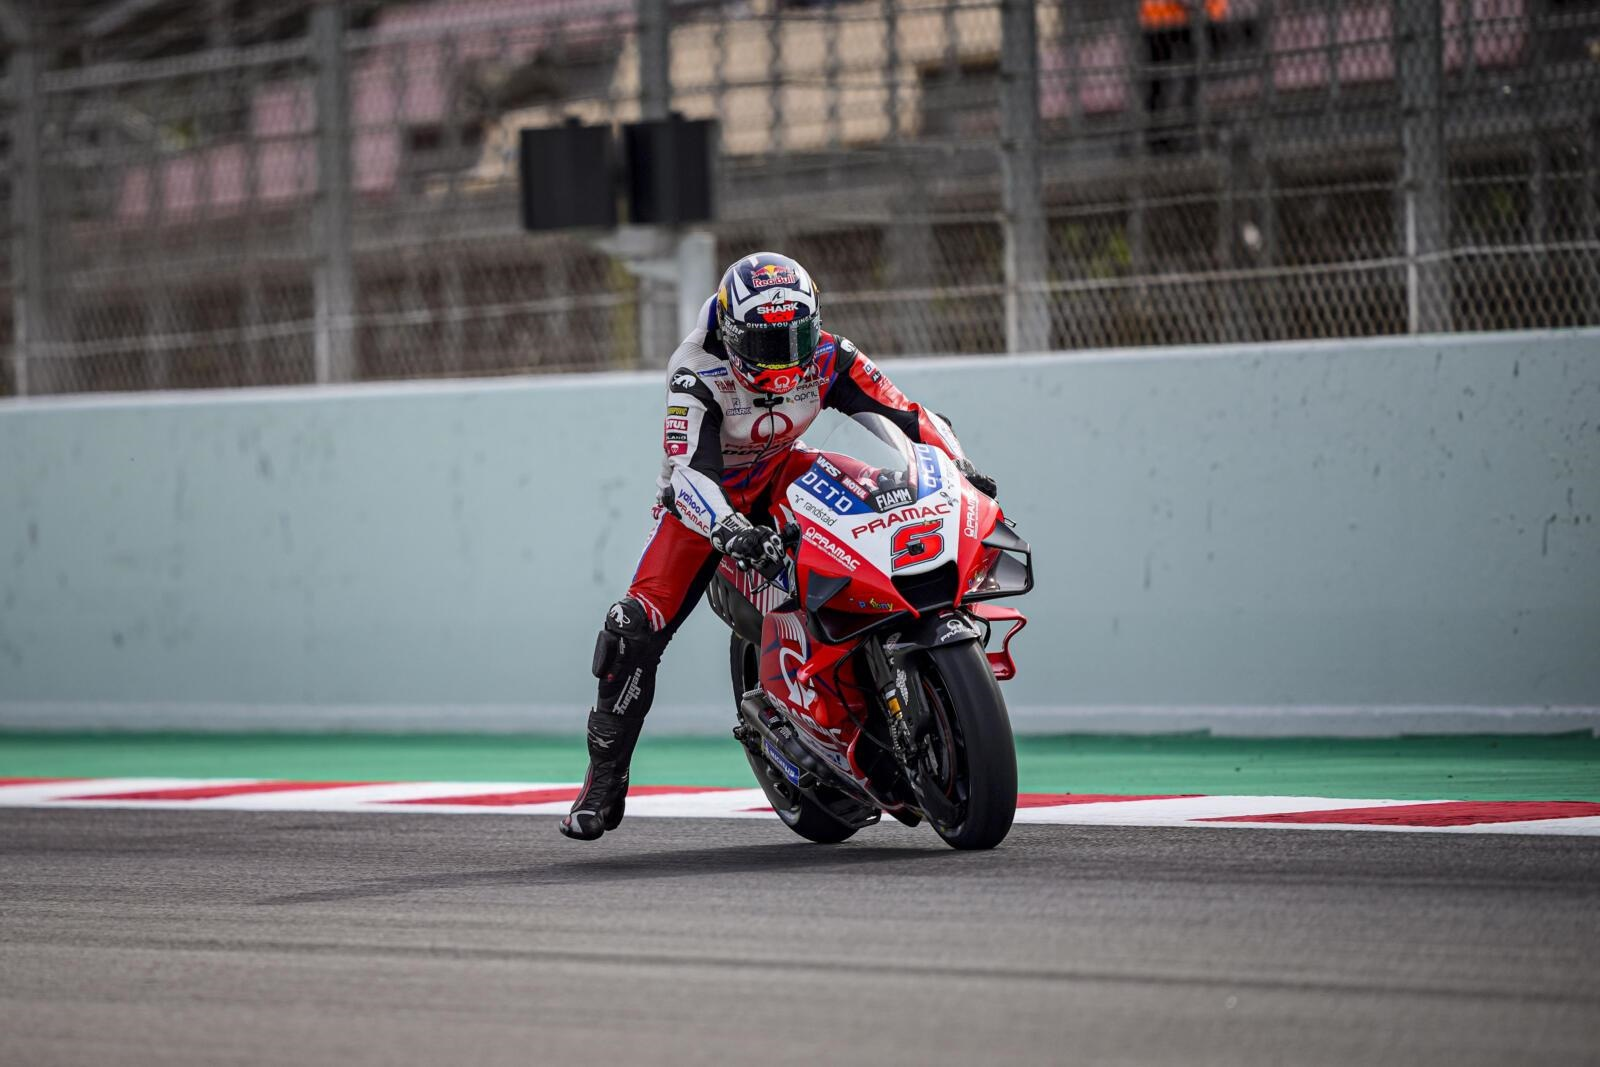 Johann Zarco Pramac Ducati MotoGP Catalunya day 1 update